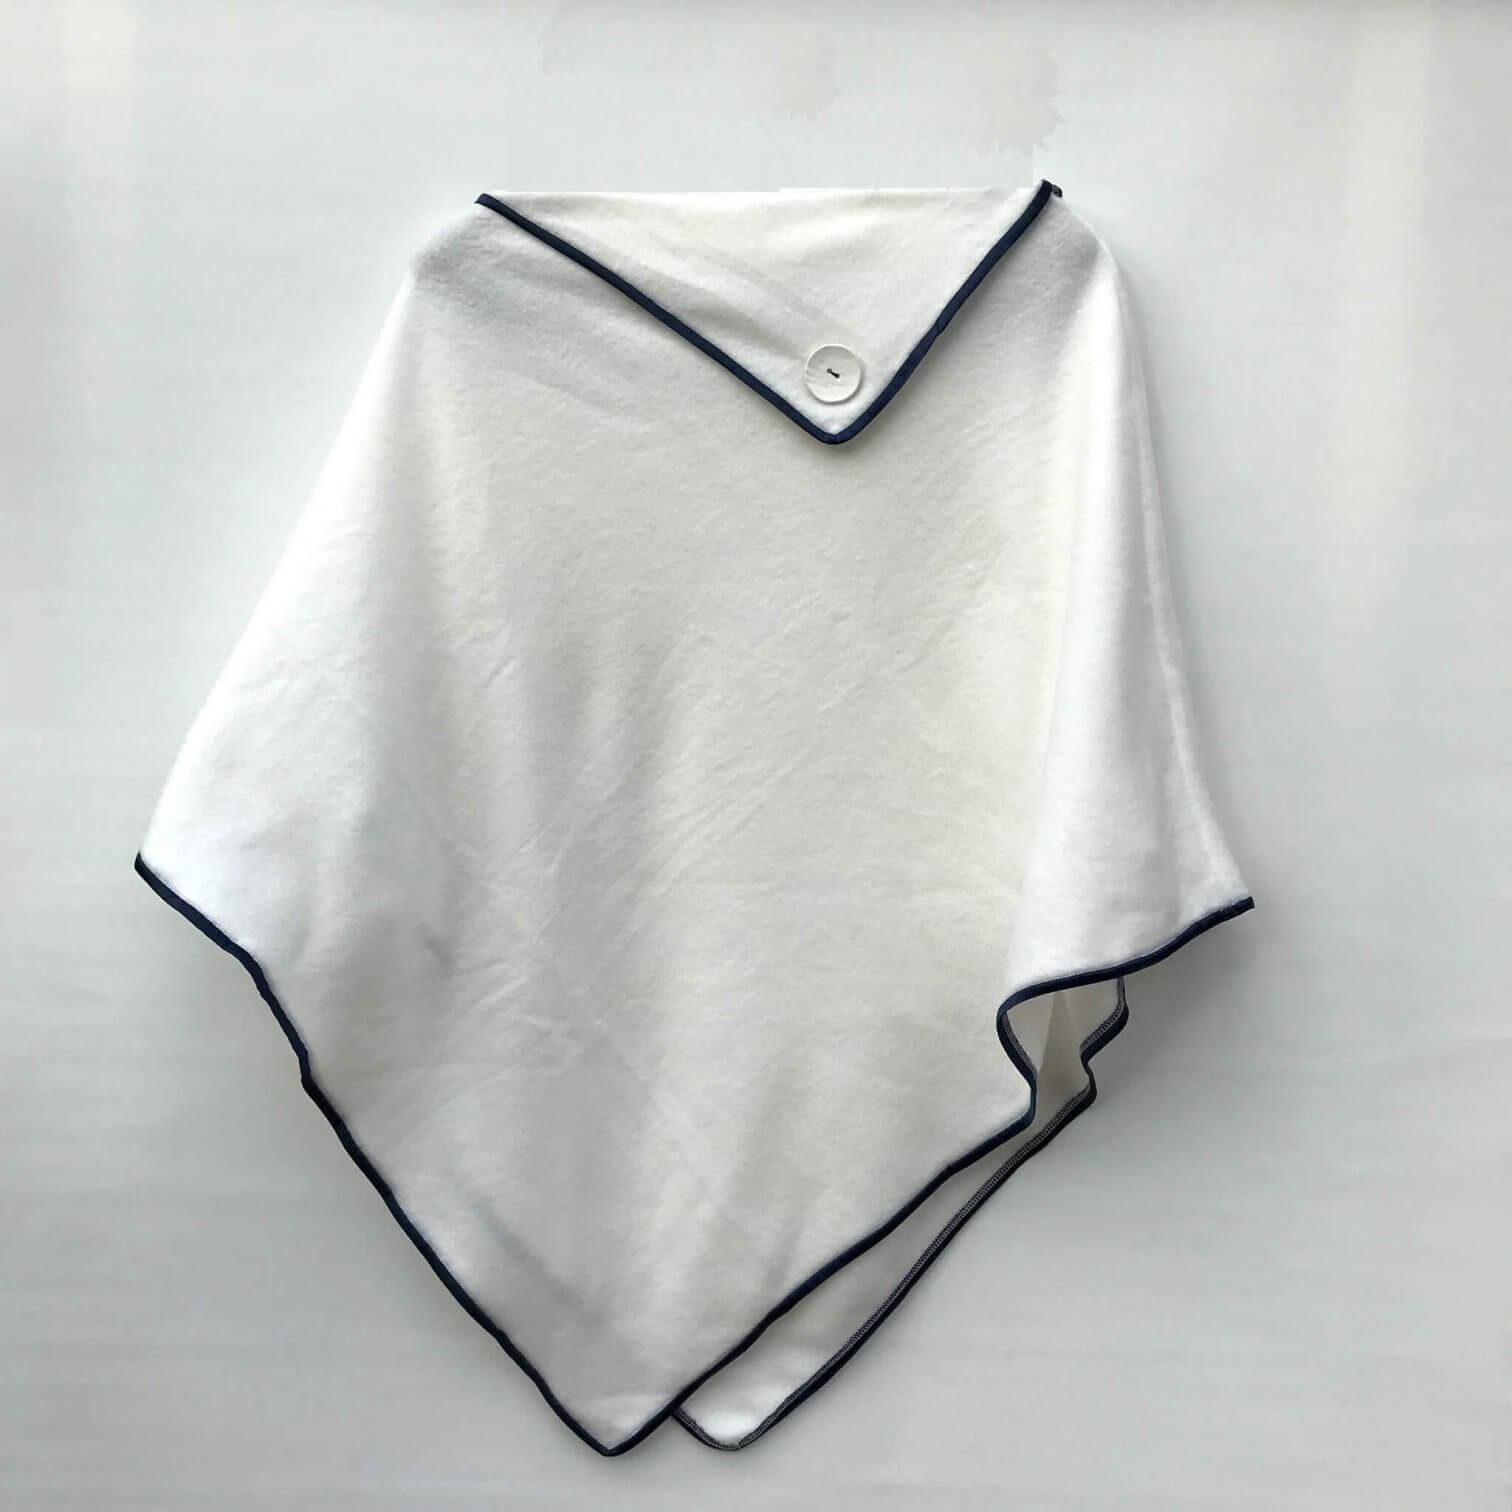 angesagter Poncho in weiß